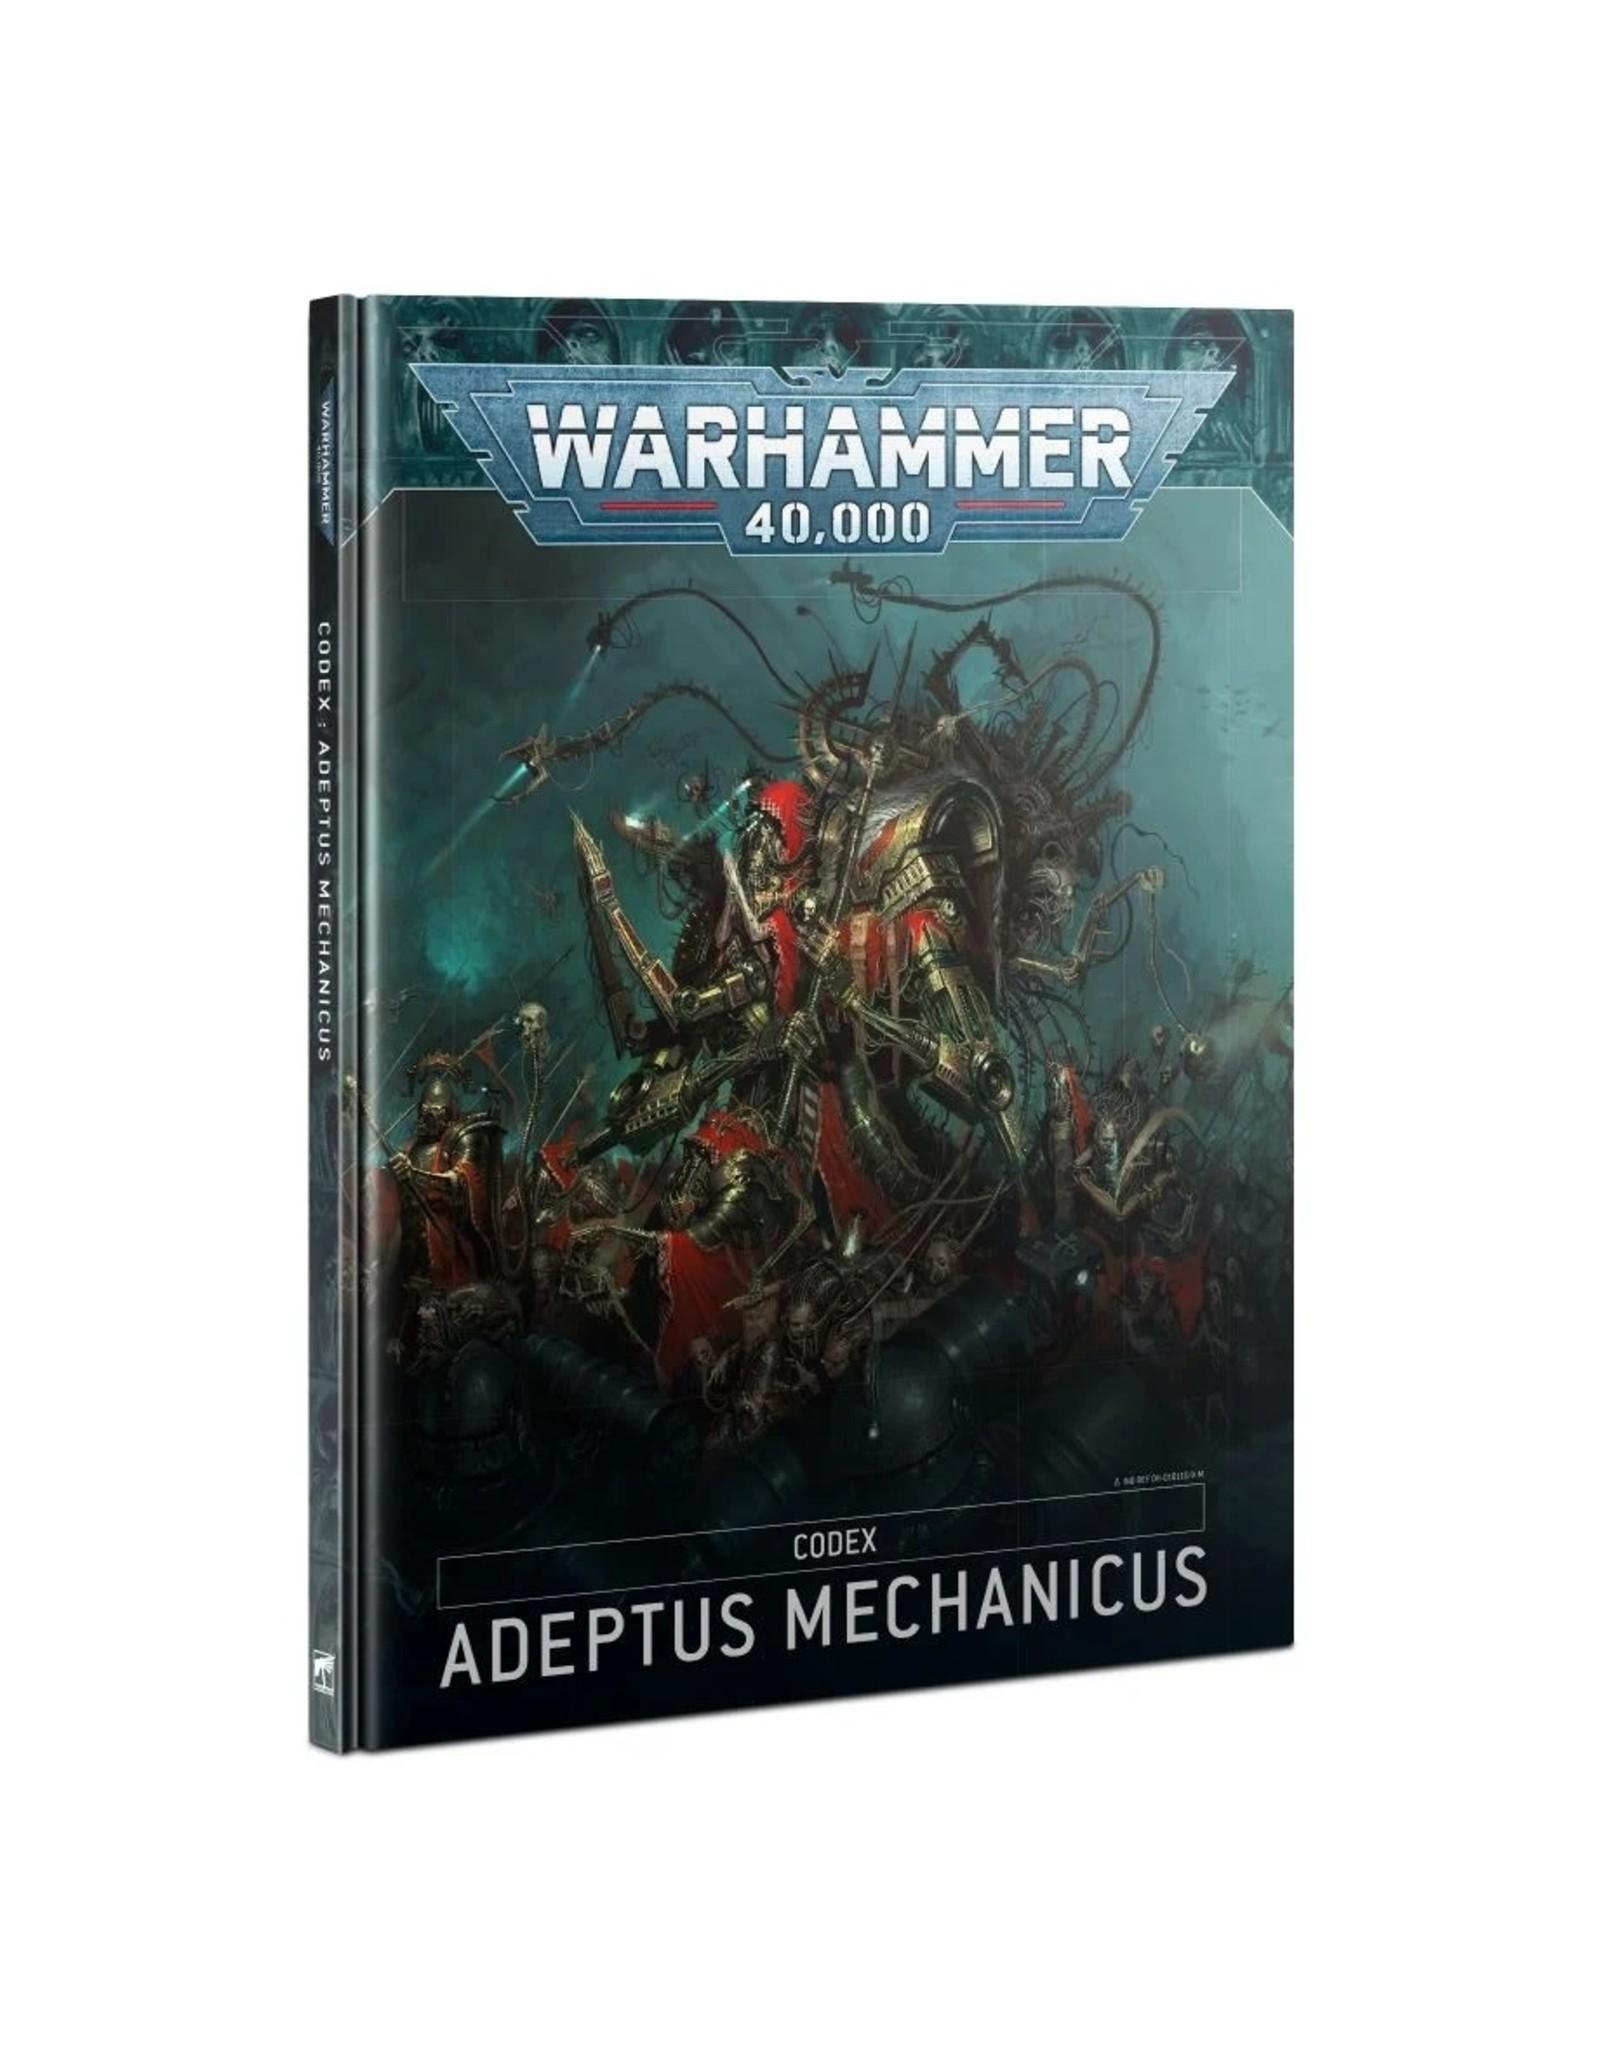 Games Workshop WH40k Codex: Adeptus Mechanicus 9th